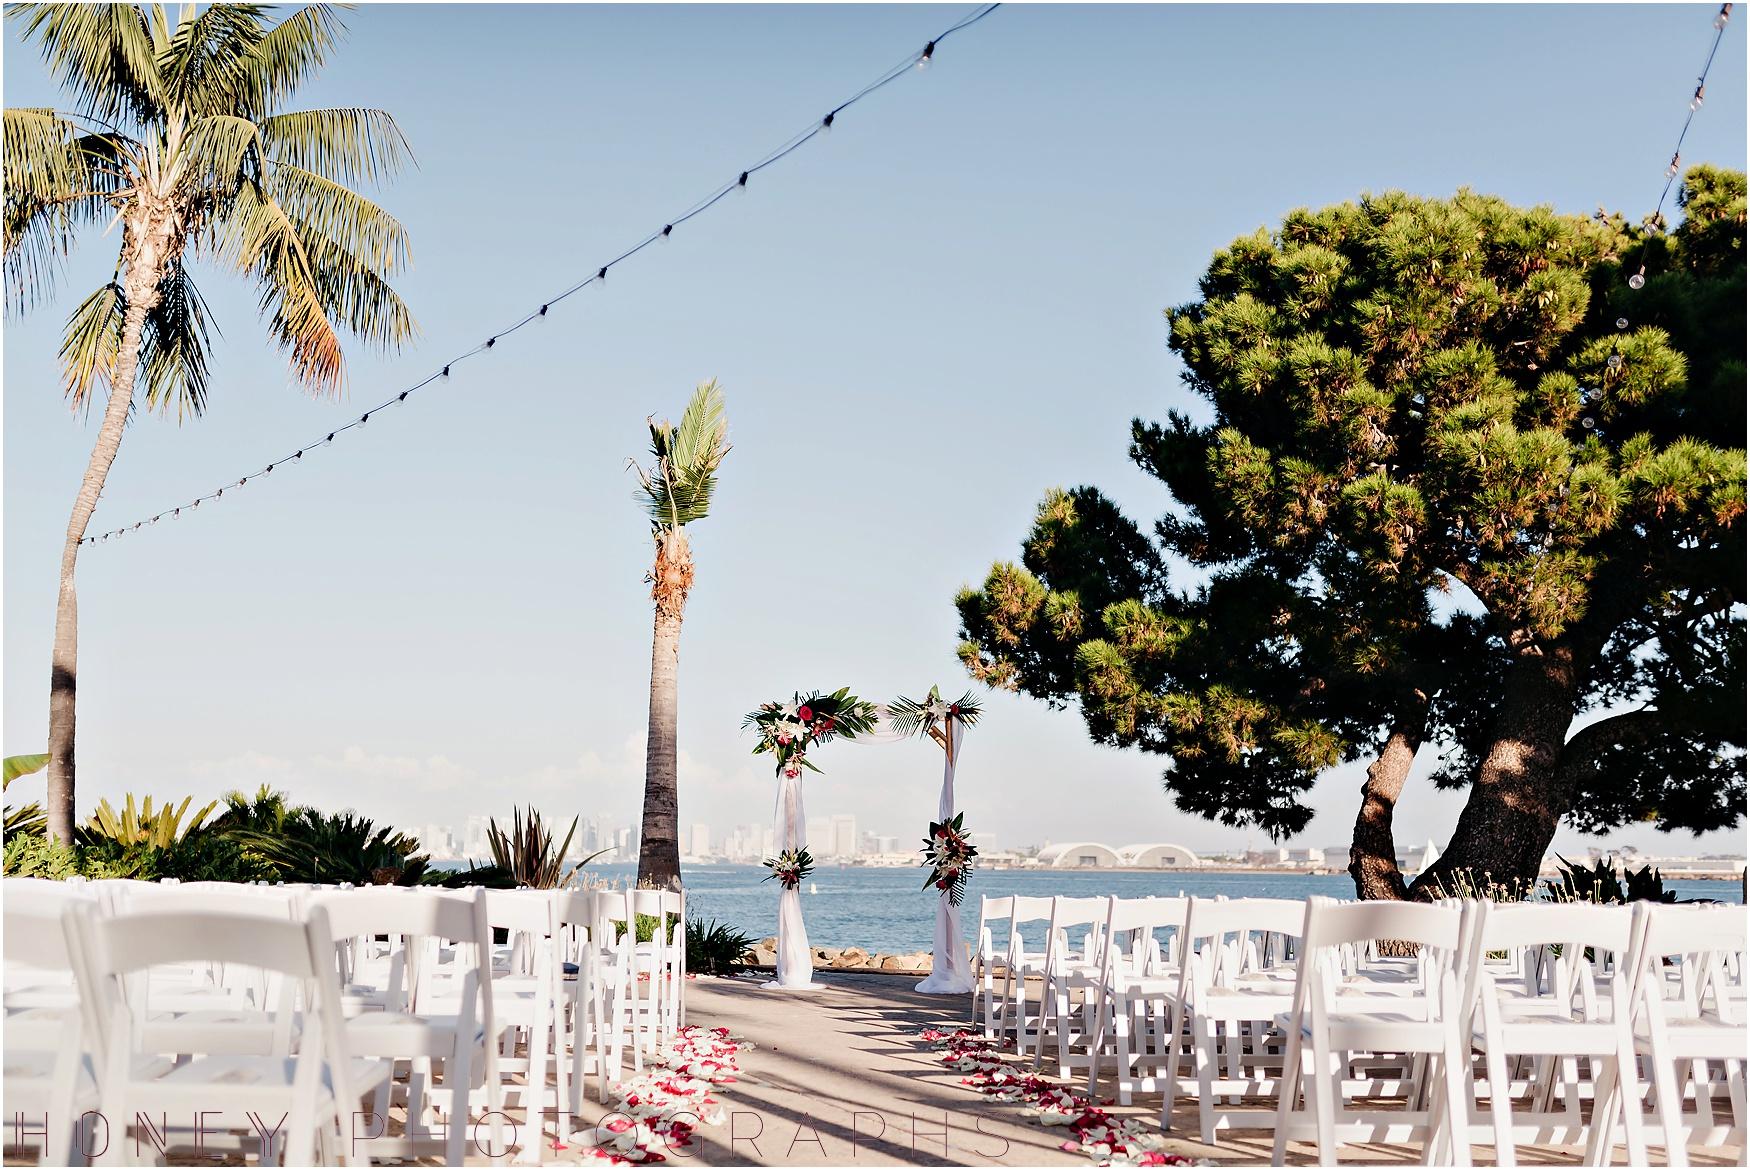 bali-hai-tropical-bubble-exit-party-paradise-wedding016.jpg